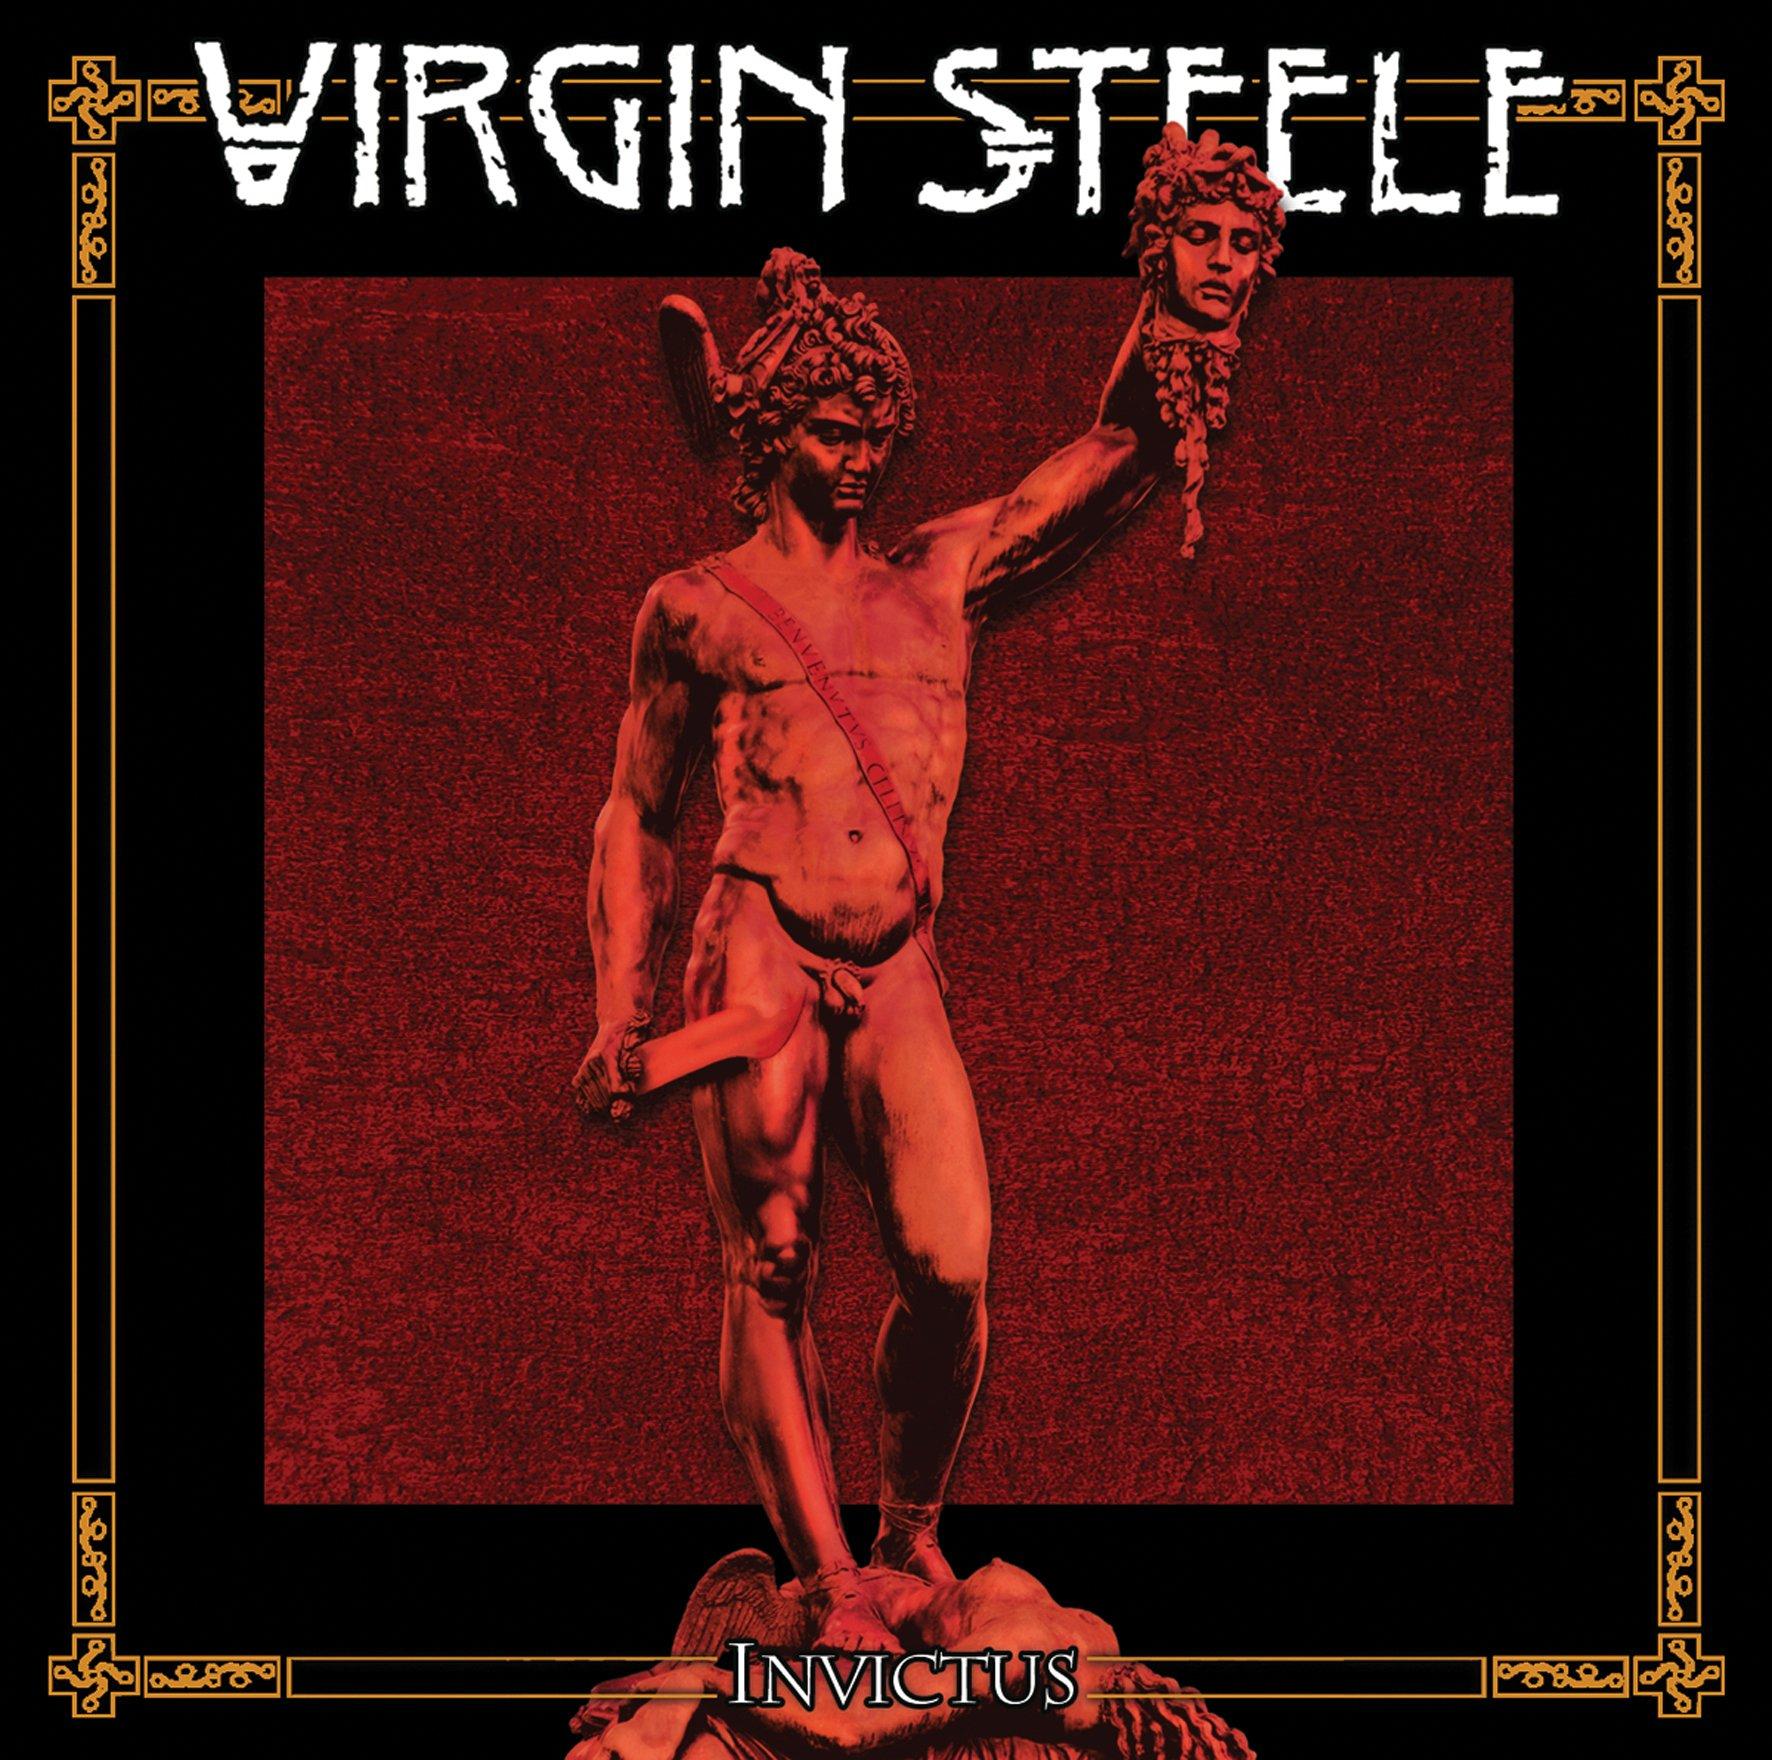 Virgin Steele – Invictus (2014) [FLAC]